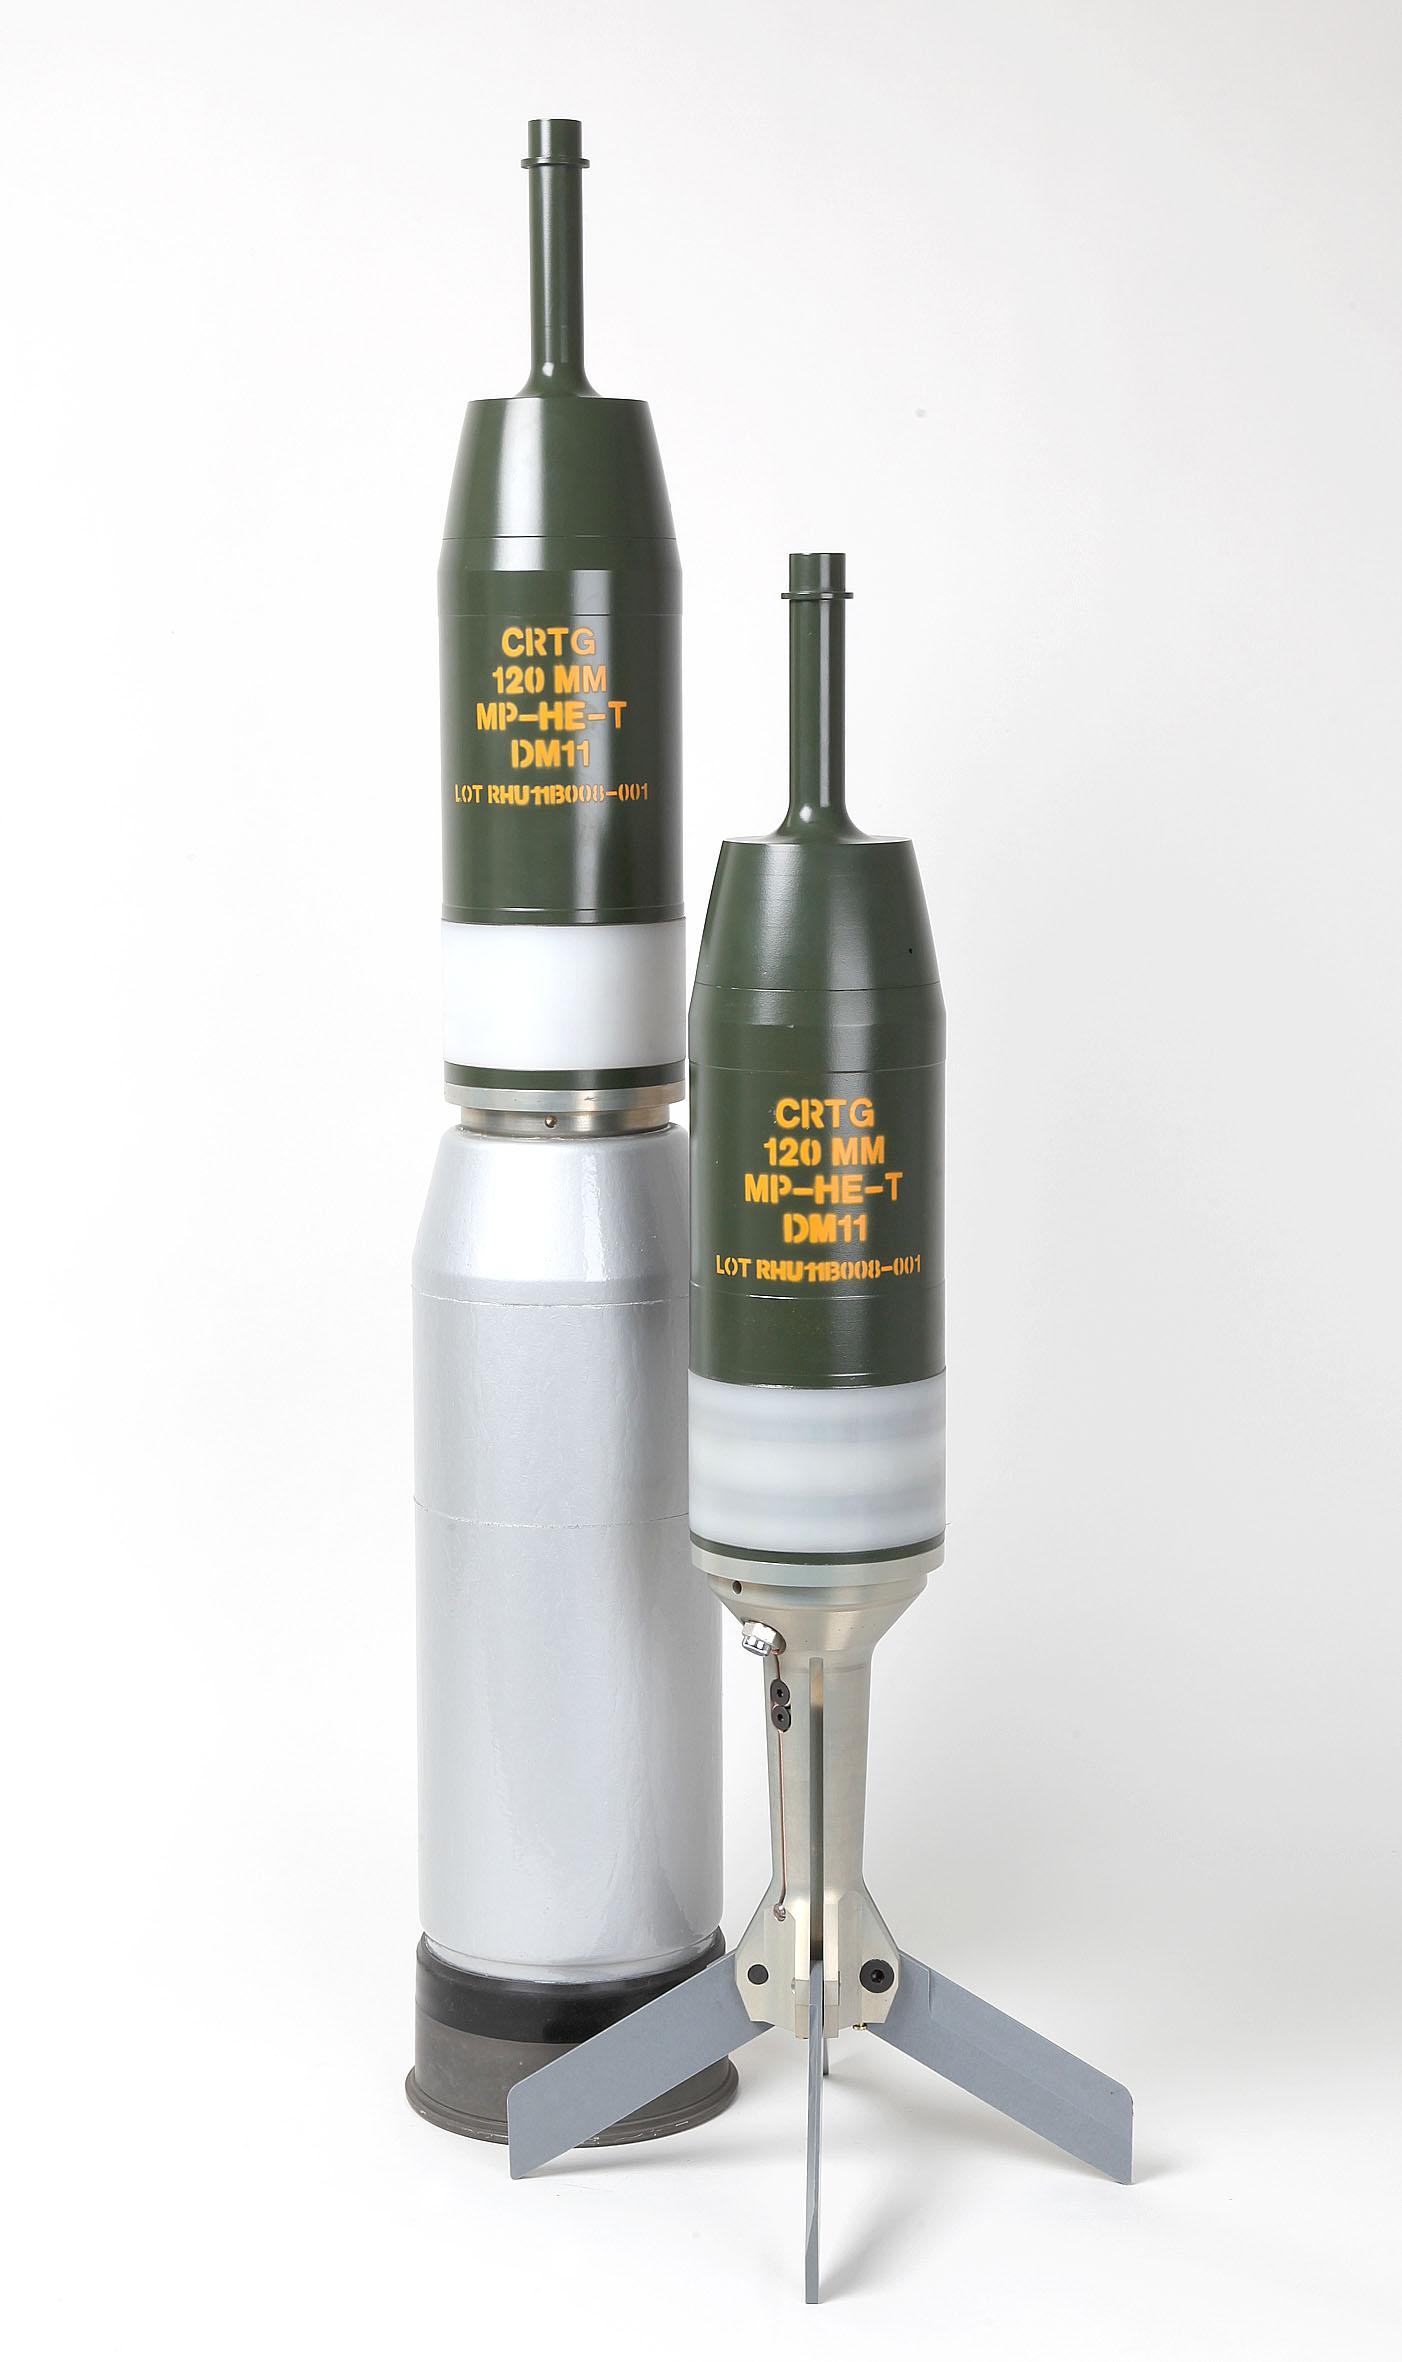 German Rheinmetall 120 mm DM11